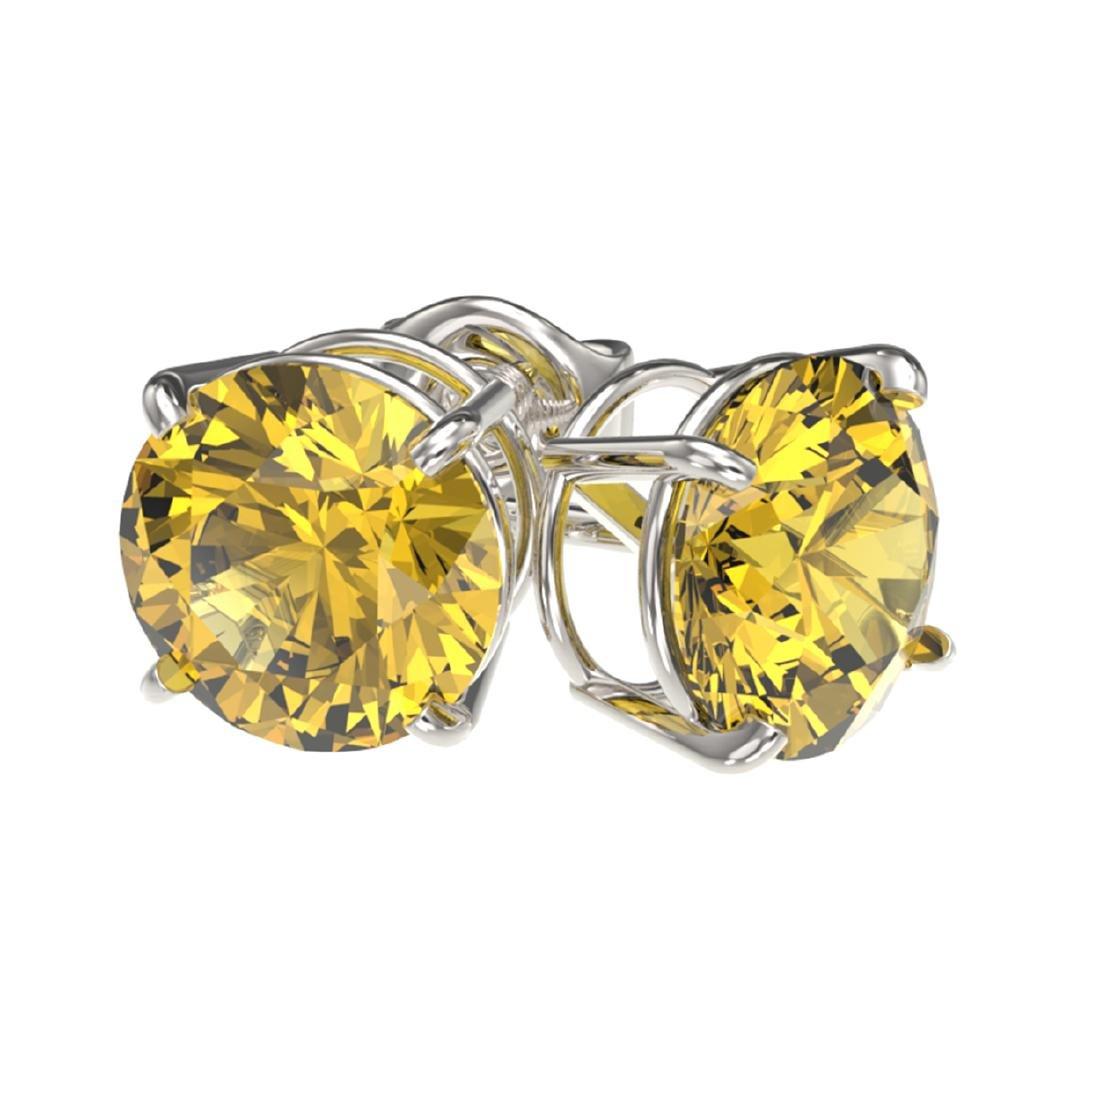 2.11 ctw Intense Yellow Diamond Stud Earrings 10K White - 3